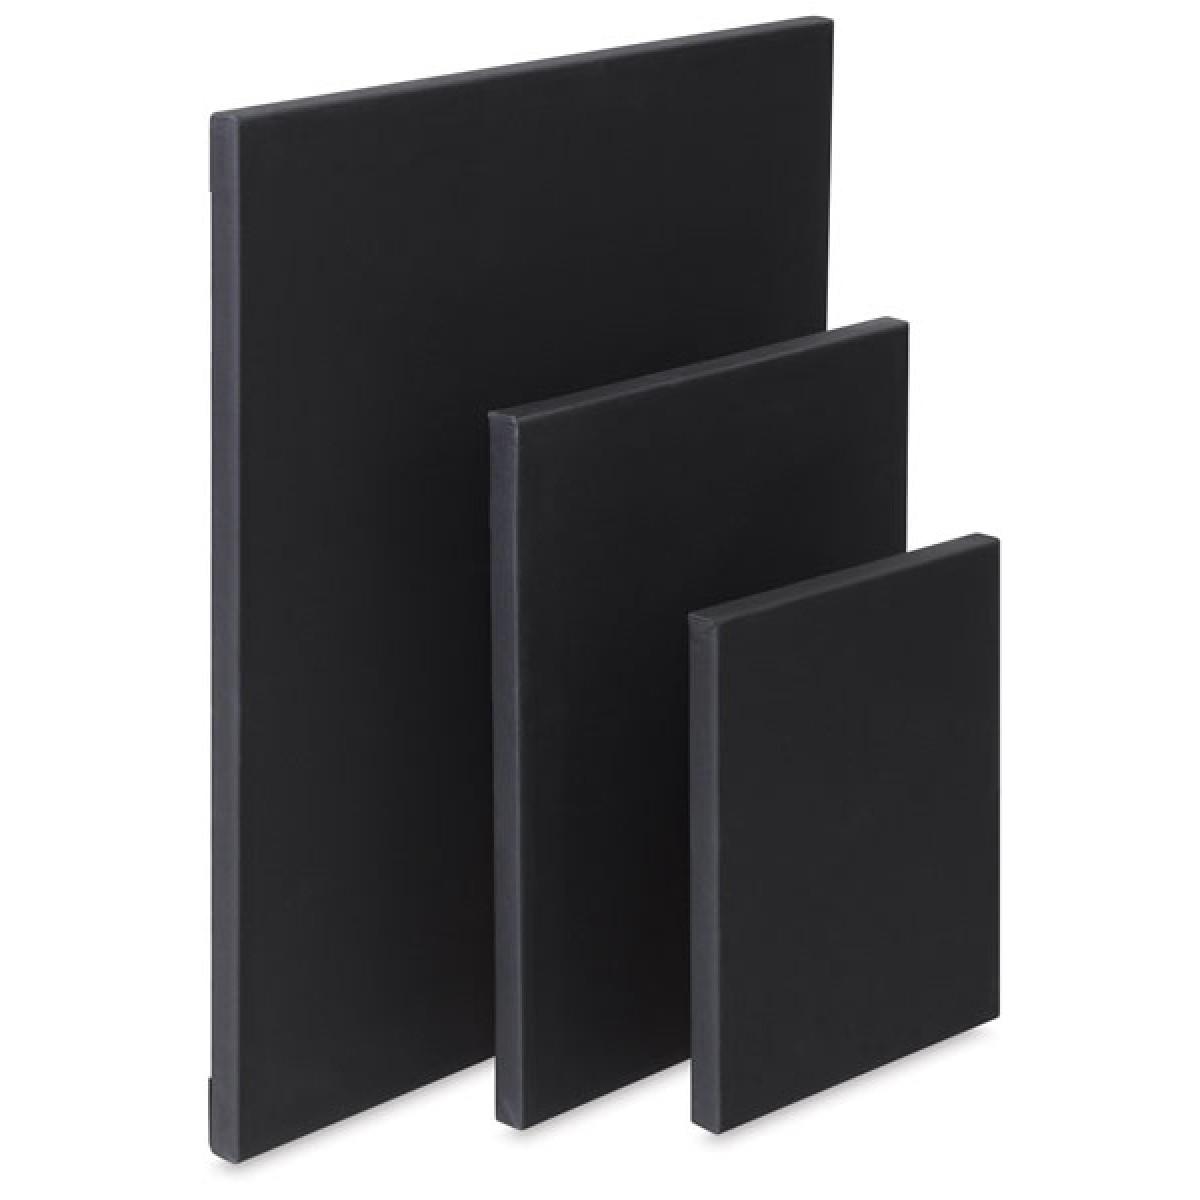 PROFI 2, lærred, 1,7 cm, sort